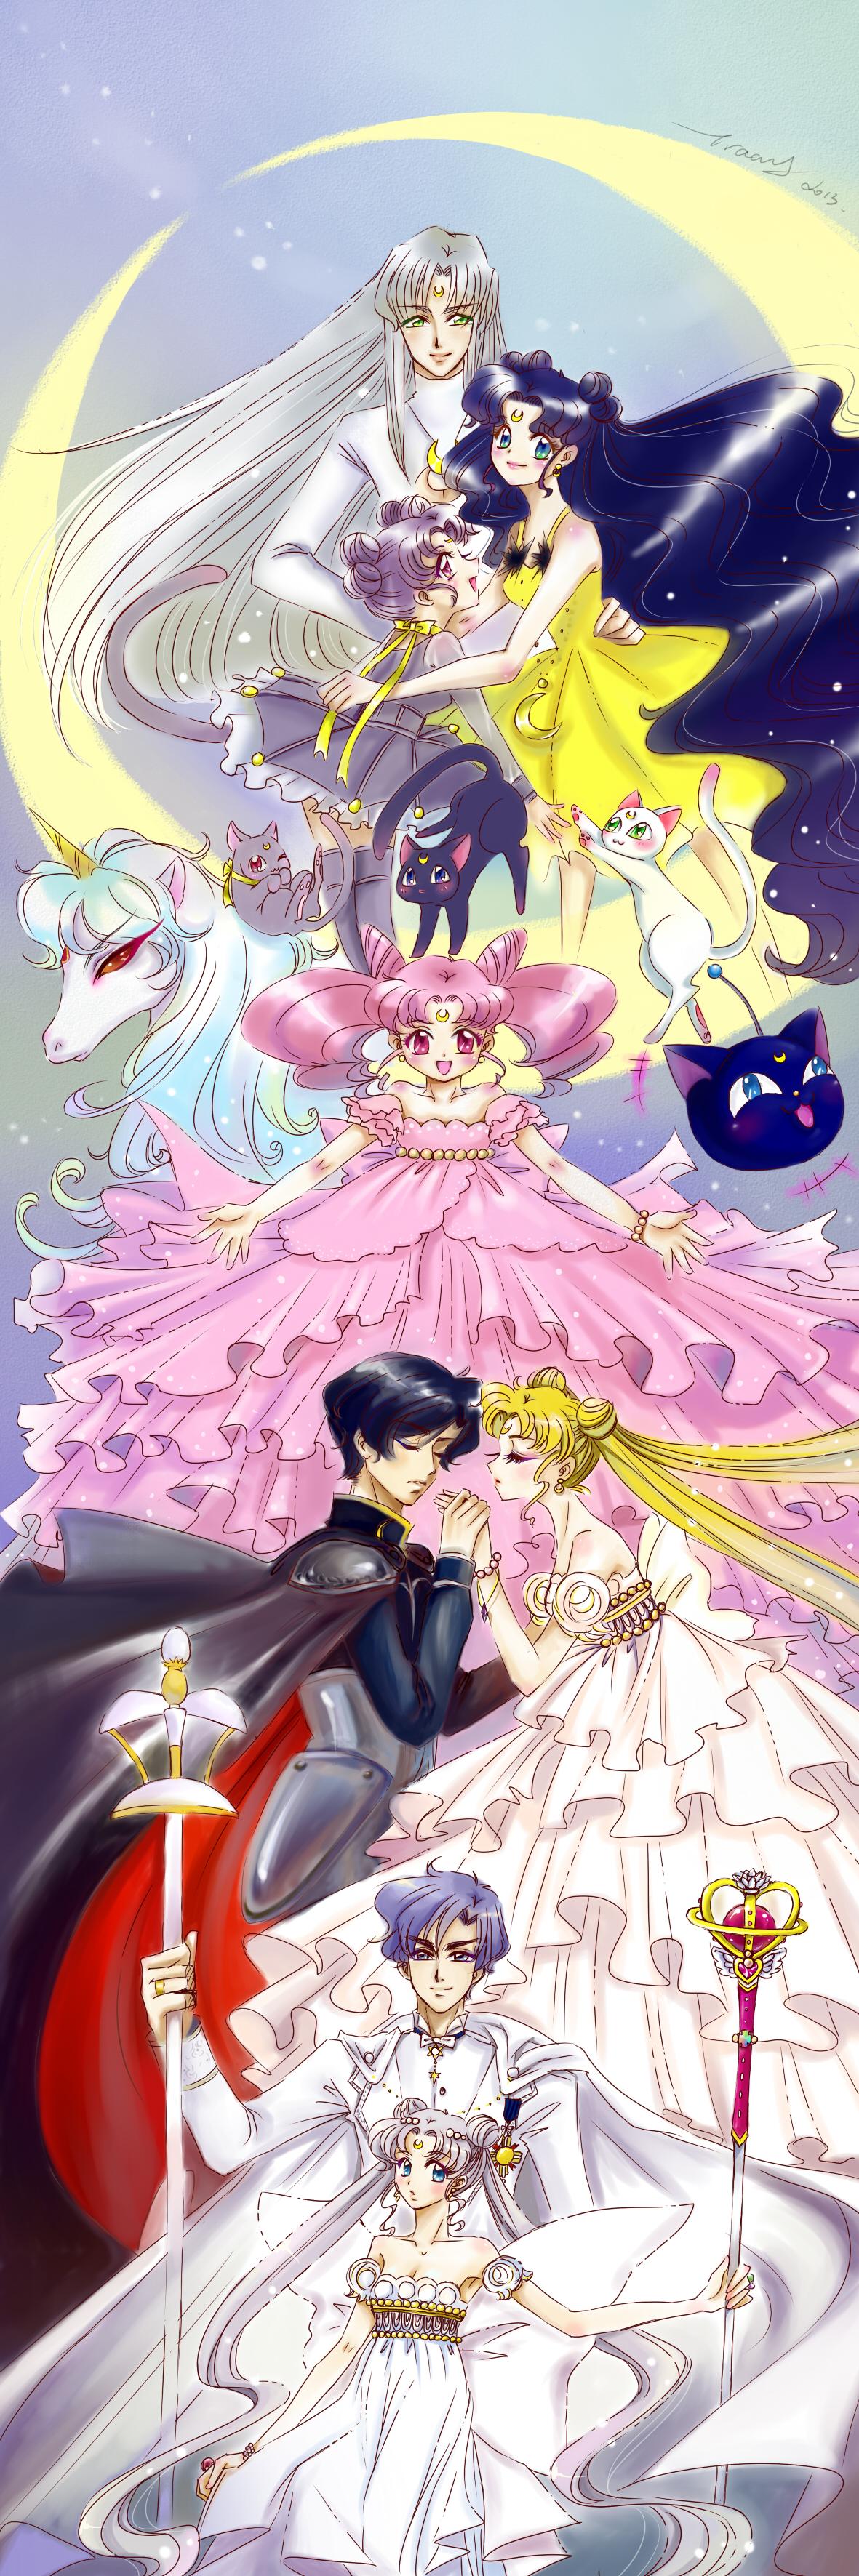 Human Artemis Artemis Sailor Moon Zerochan Anime Image